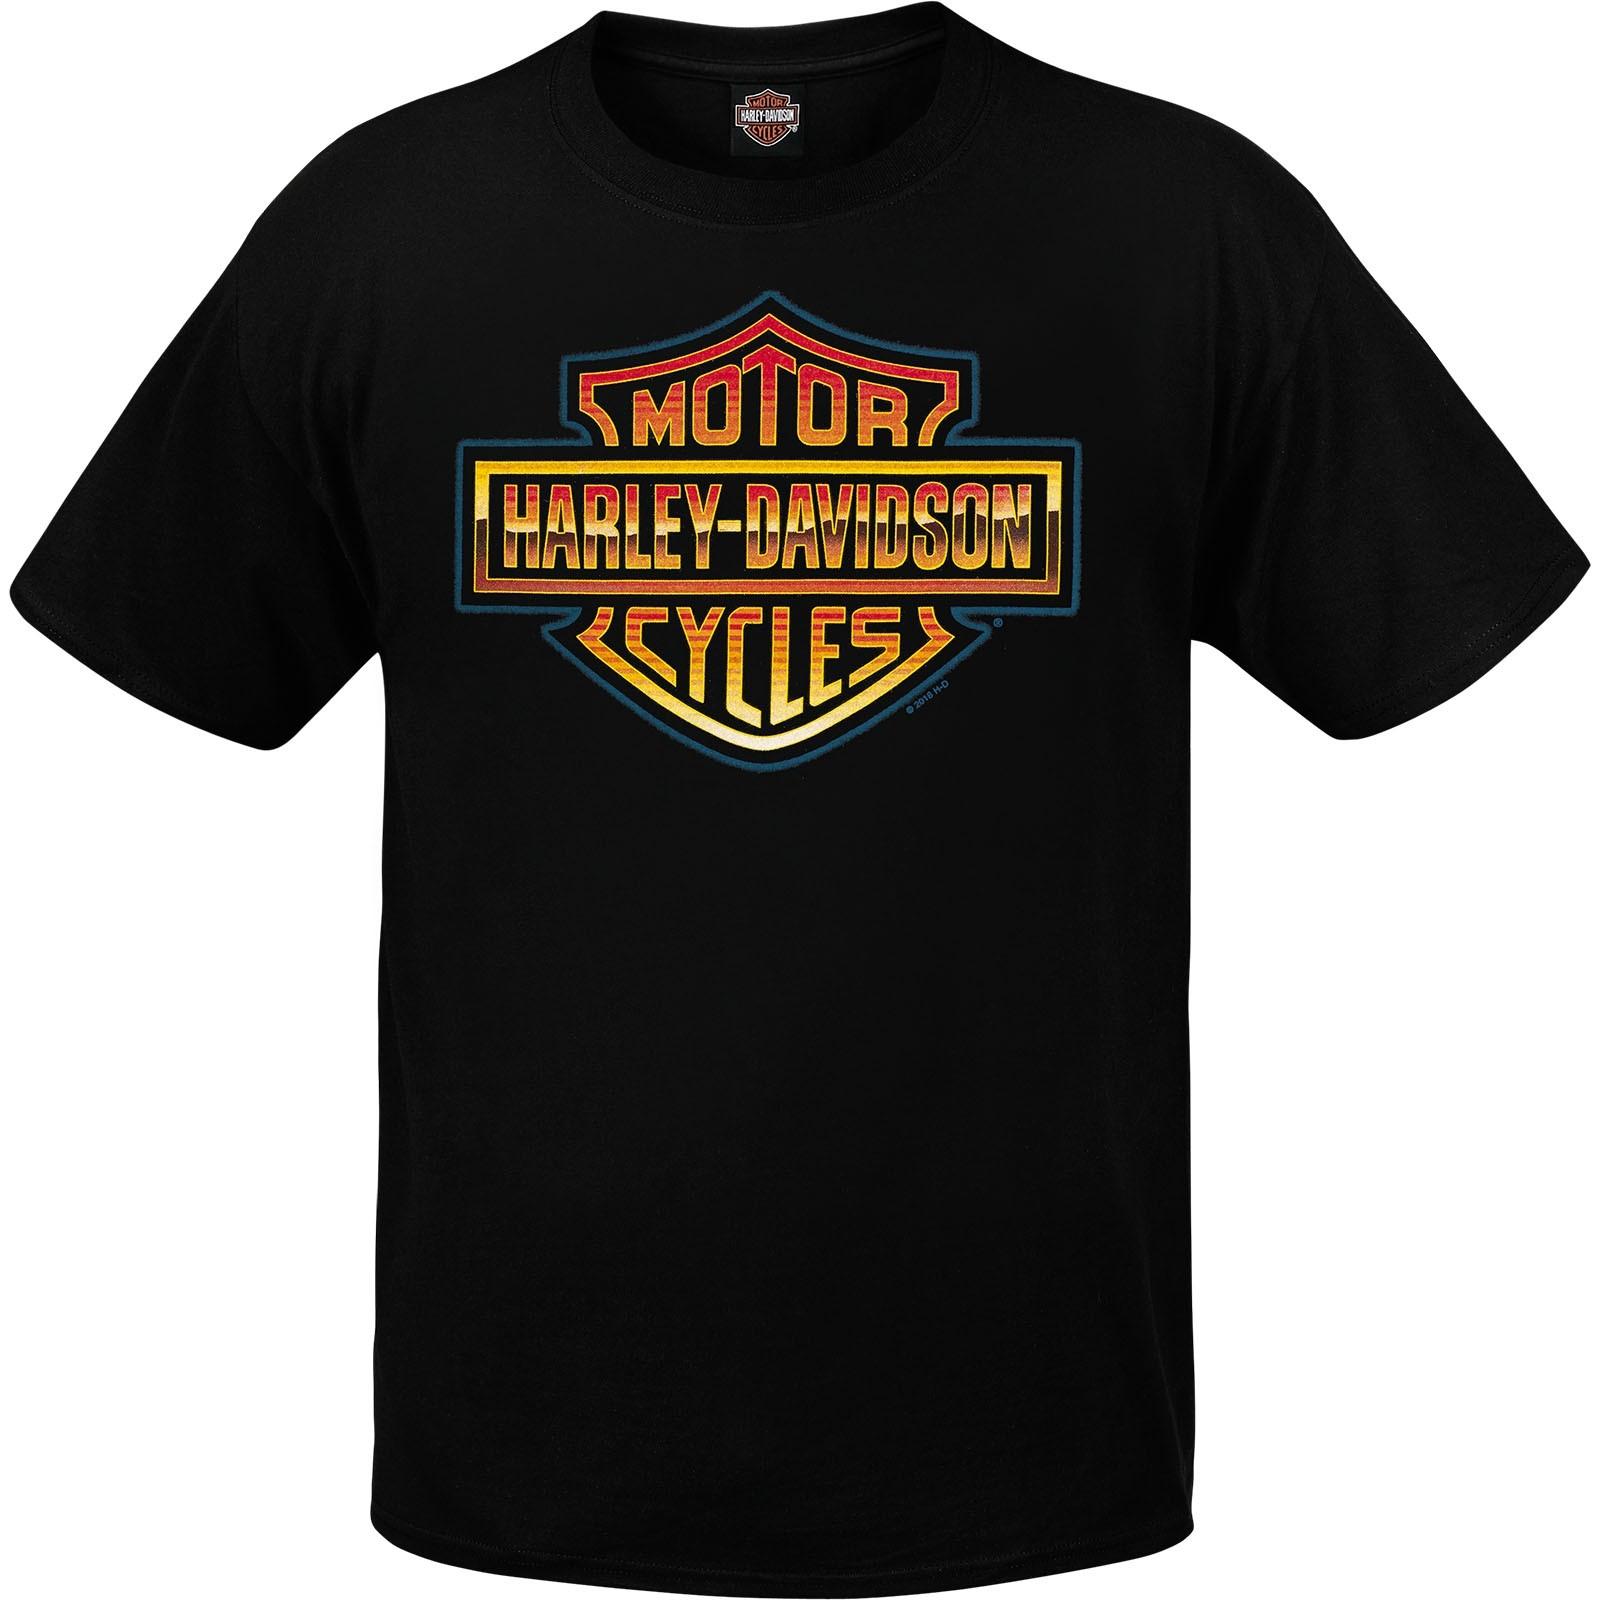 Harley-Davidson Men's Short-Sleeve T-Shirt - NSA Naples | Retro Shine